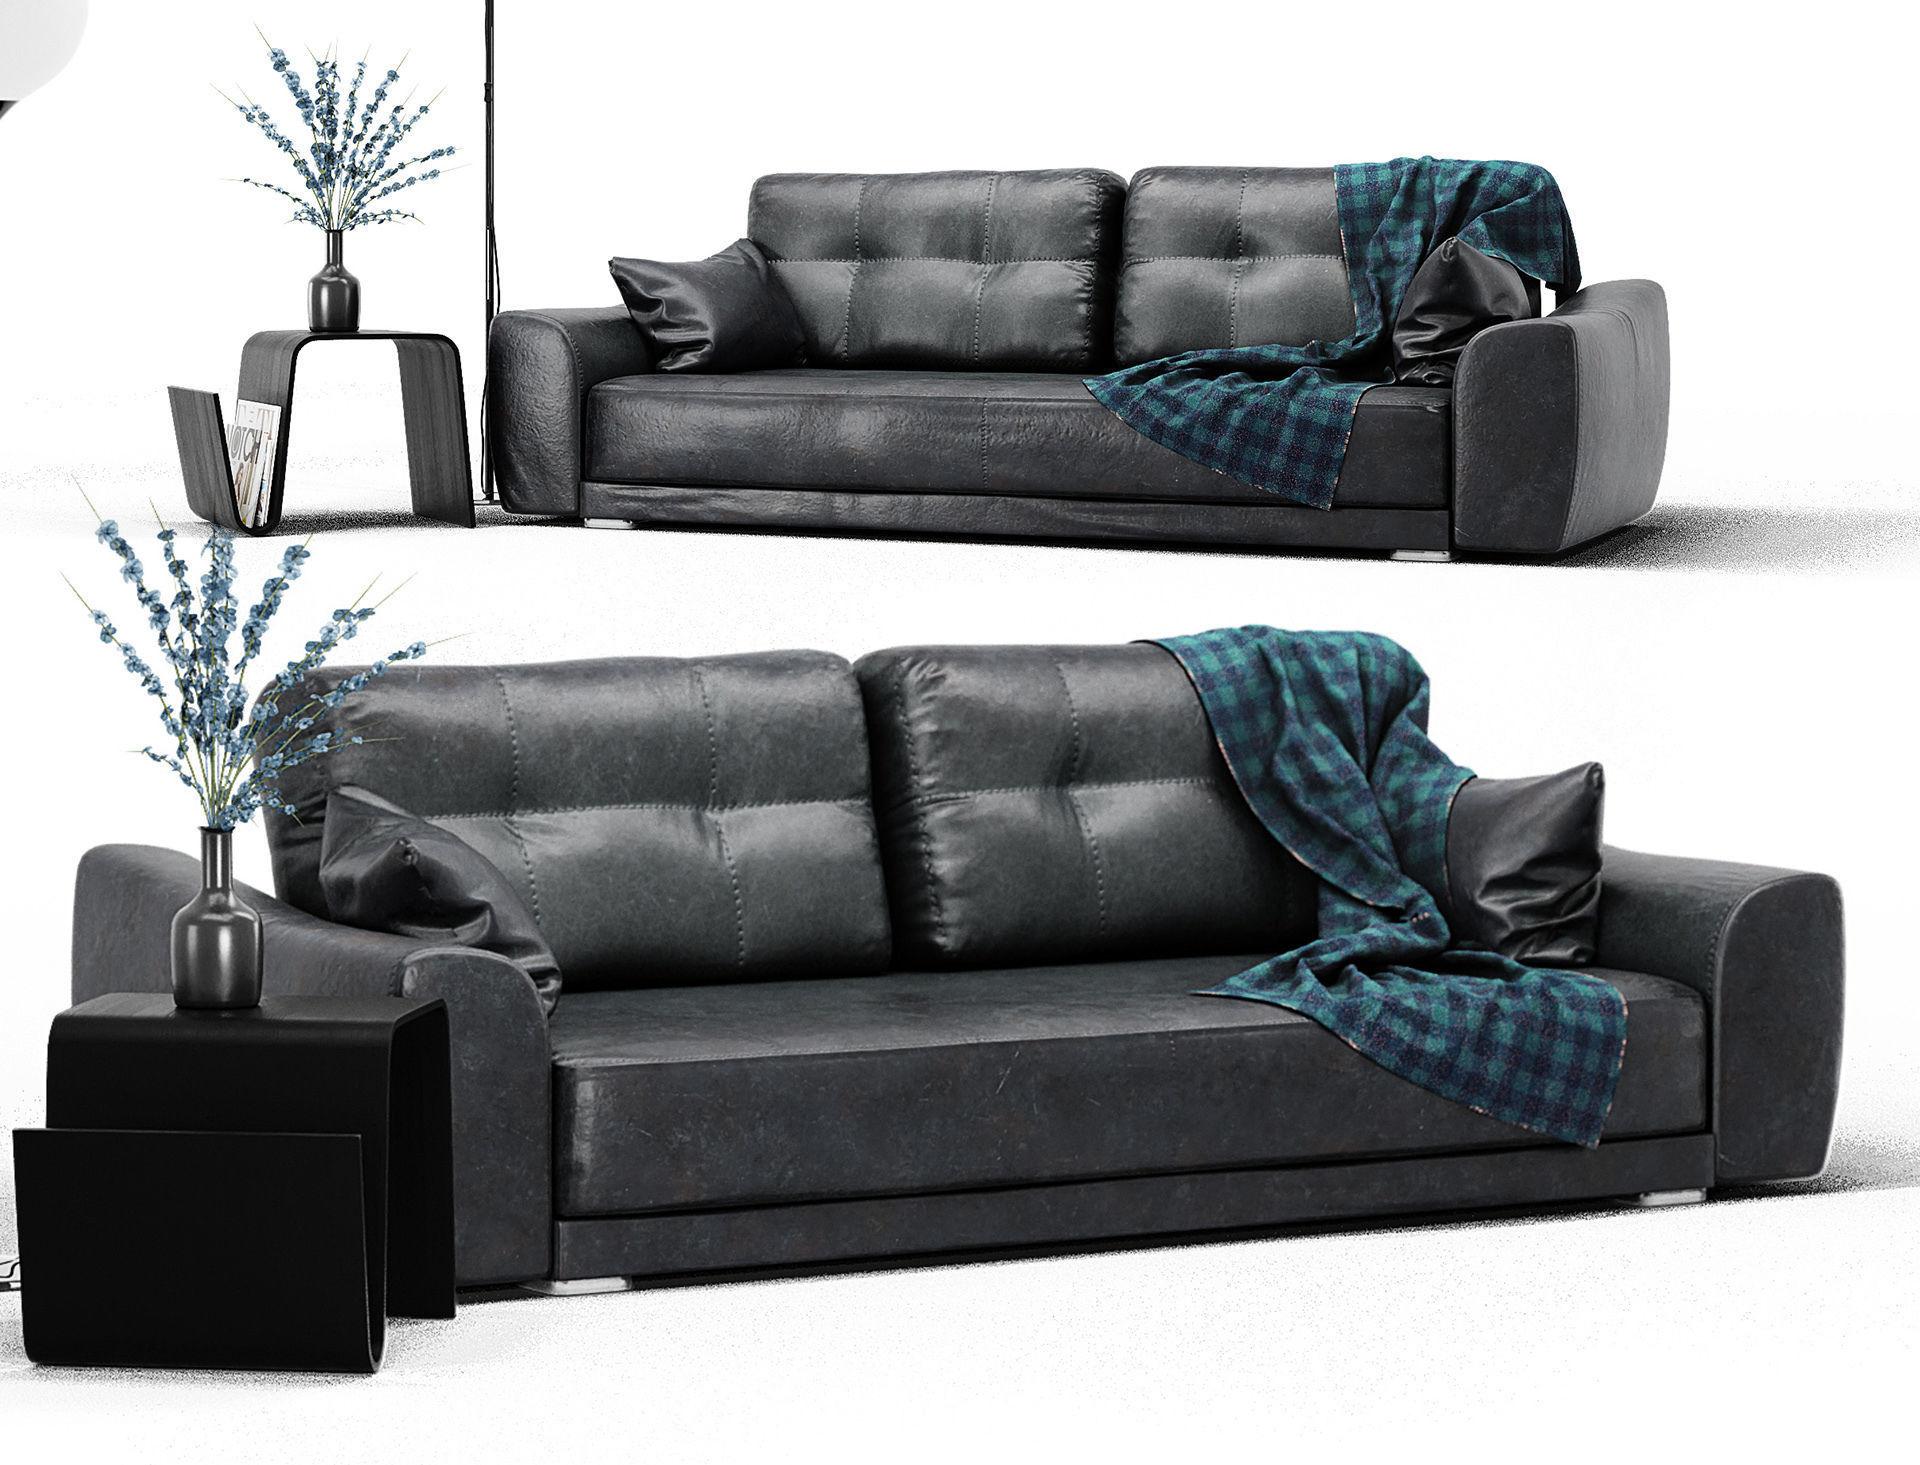 Leather Sofa Set 3D model | CGTrader